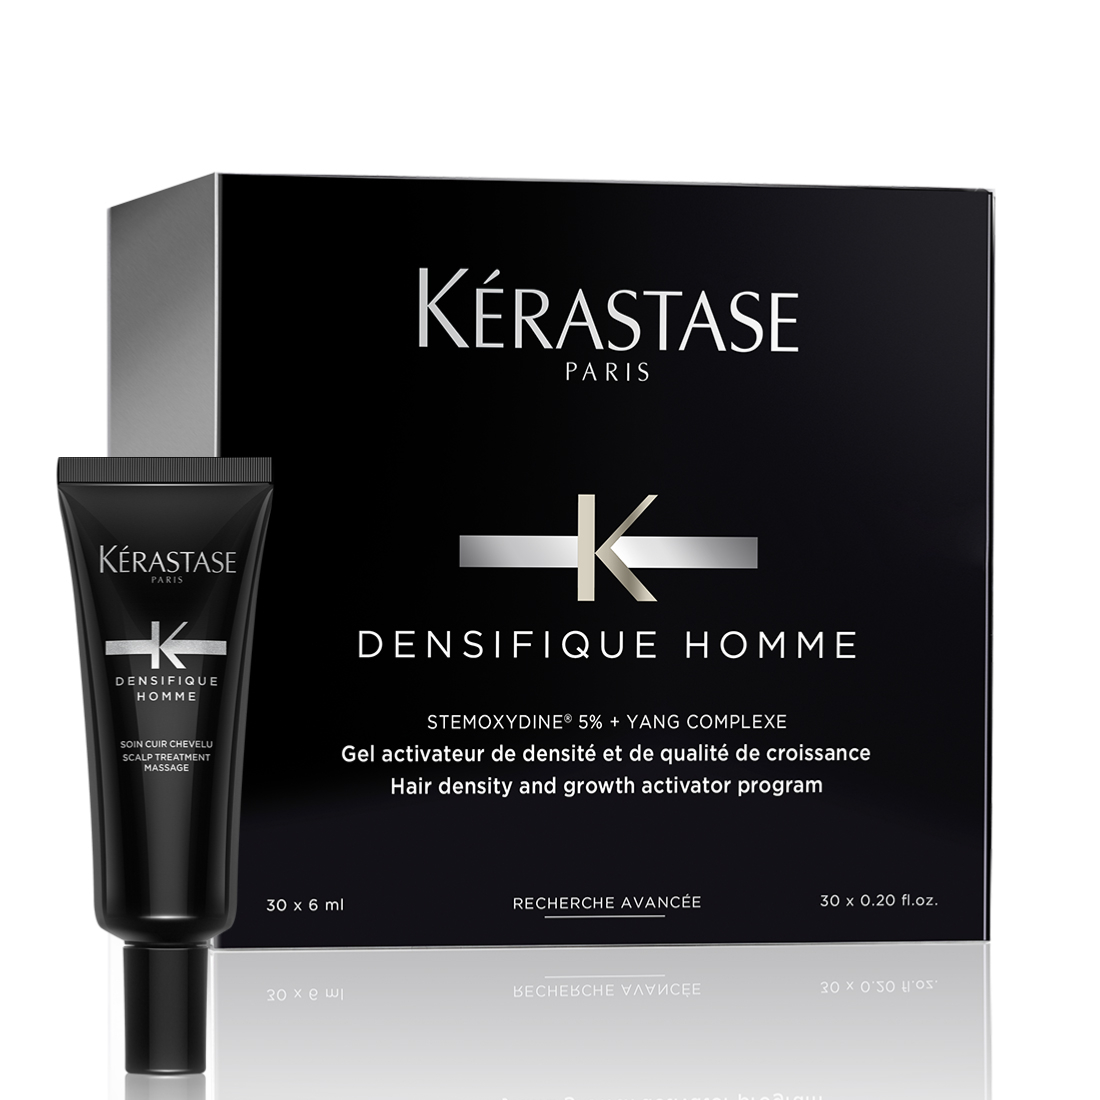 Cure Densifique Homme Kérastase 30x6ML